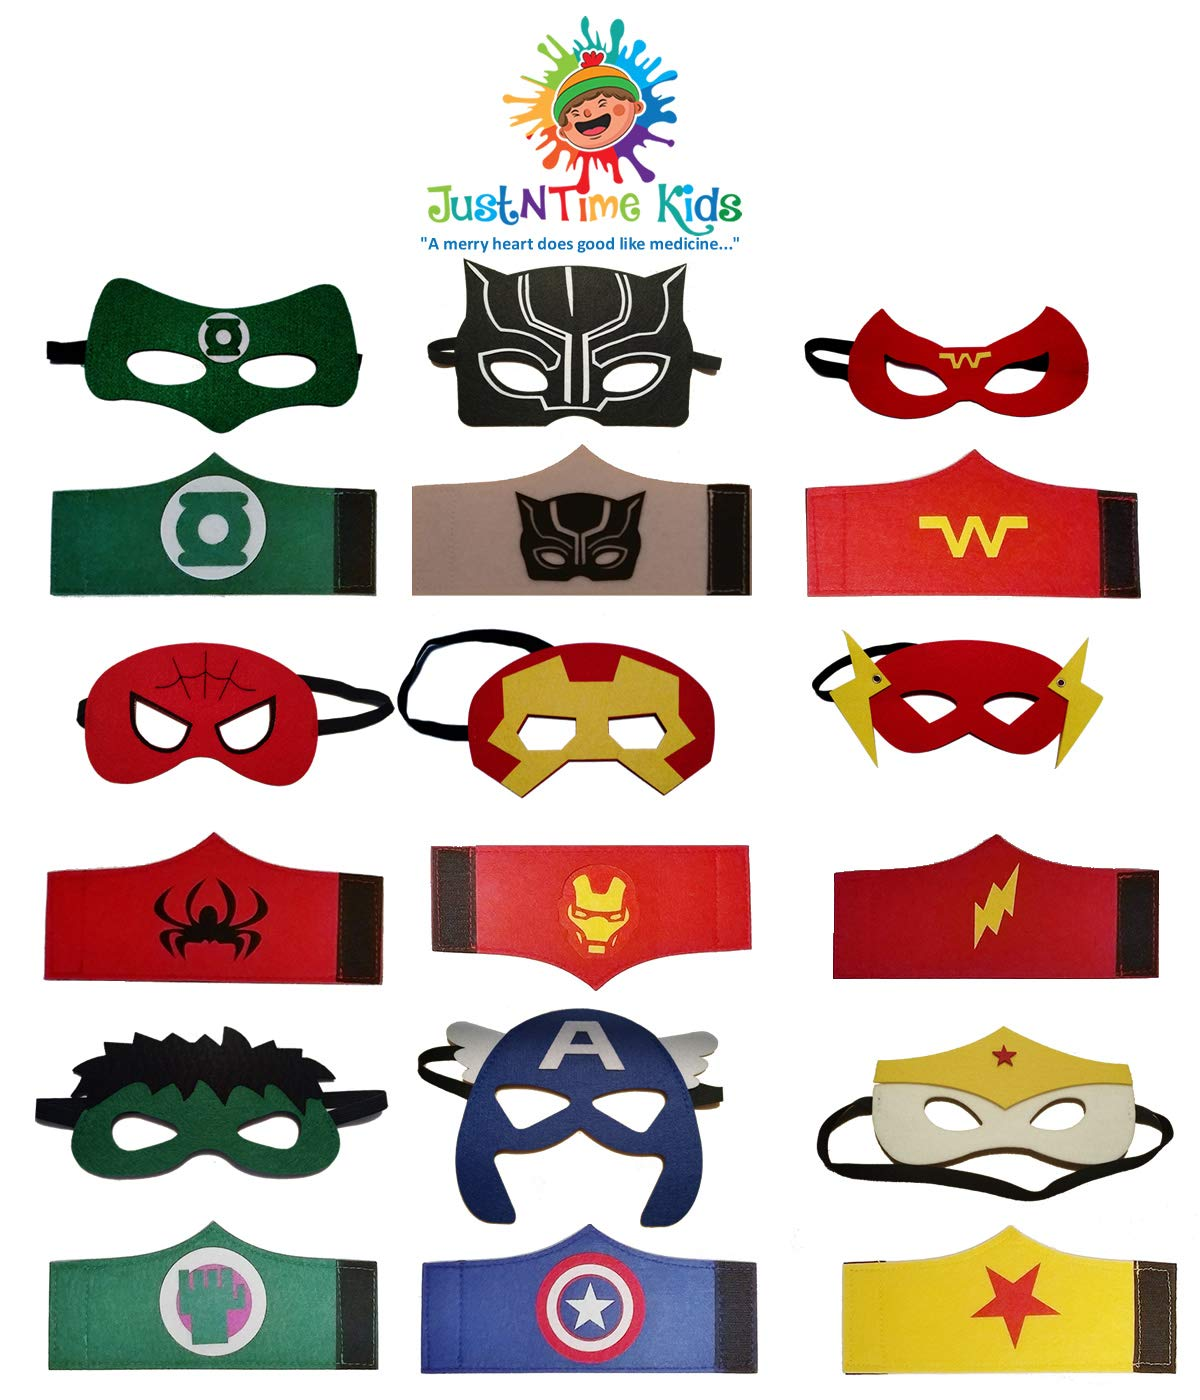 JustNTime Kids Superhero Party Mask & Bracelet Set | Includes the new Black Panther Super Hero | 9 Super heroes Comics Masks & 9 Bracelets are Great for Party Favors & Giveaways for Boys & Girls